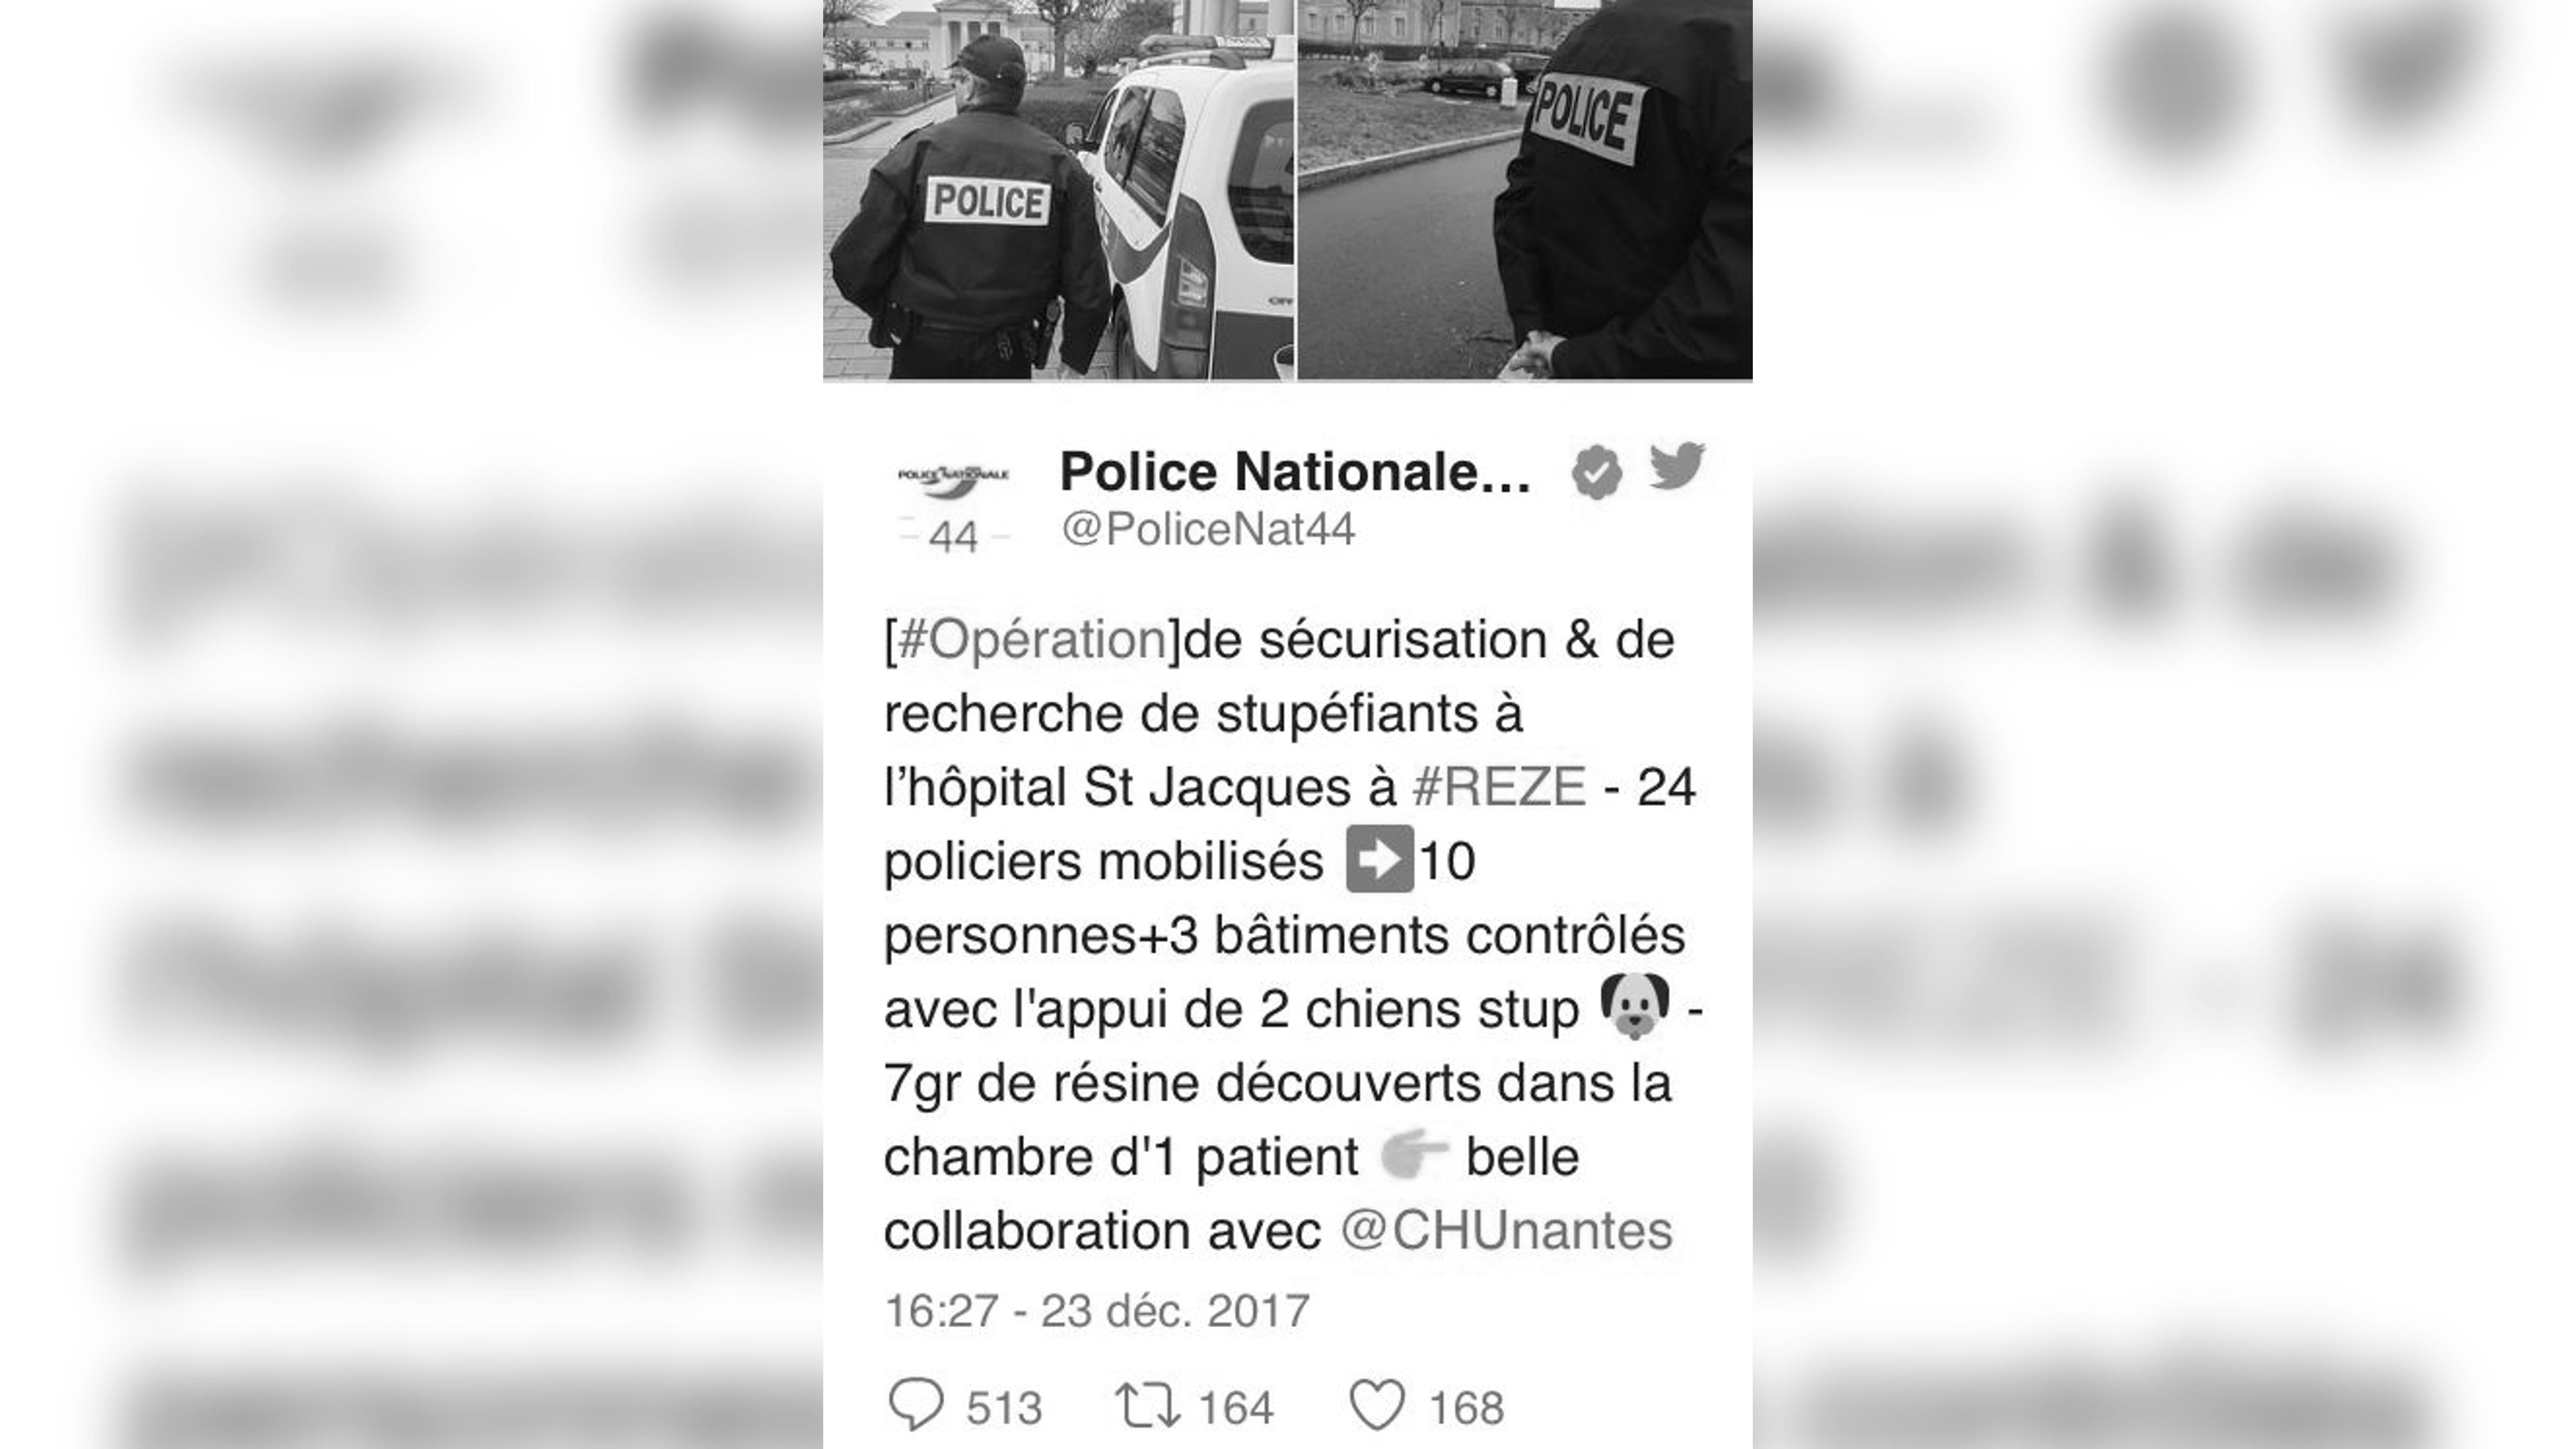 Film Star Faces Jail For Calling Cops Bastards In Tweet